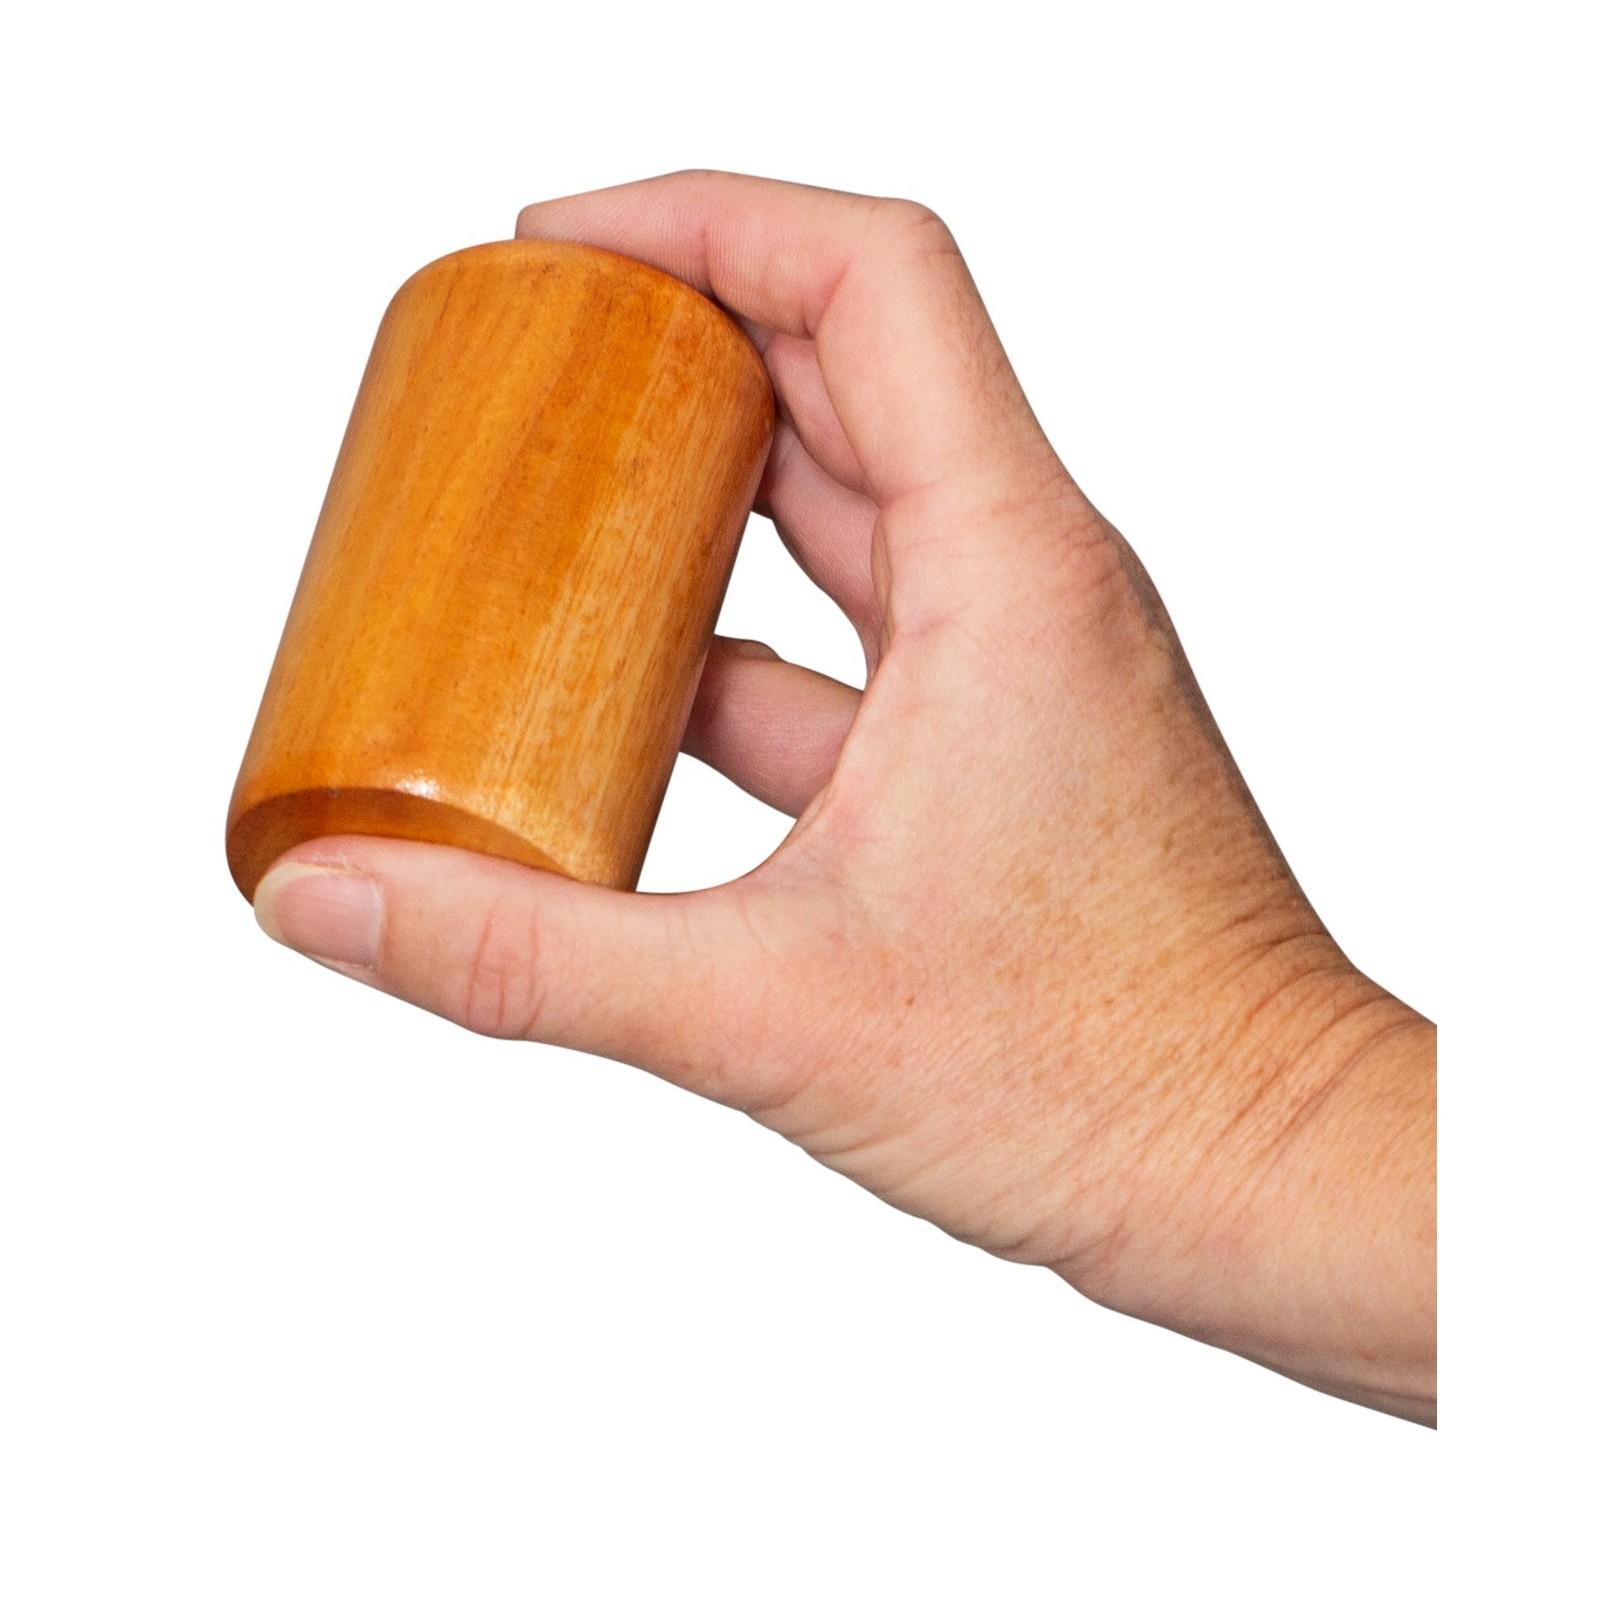 Mahogany shaker set - hand percussion - musical instrument for children - lightweight